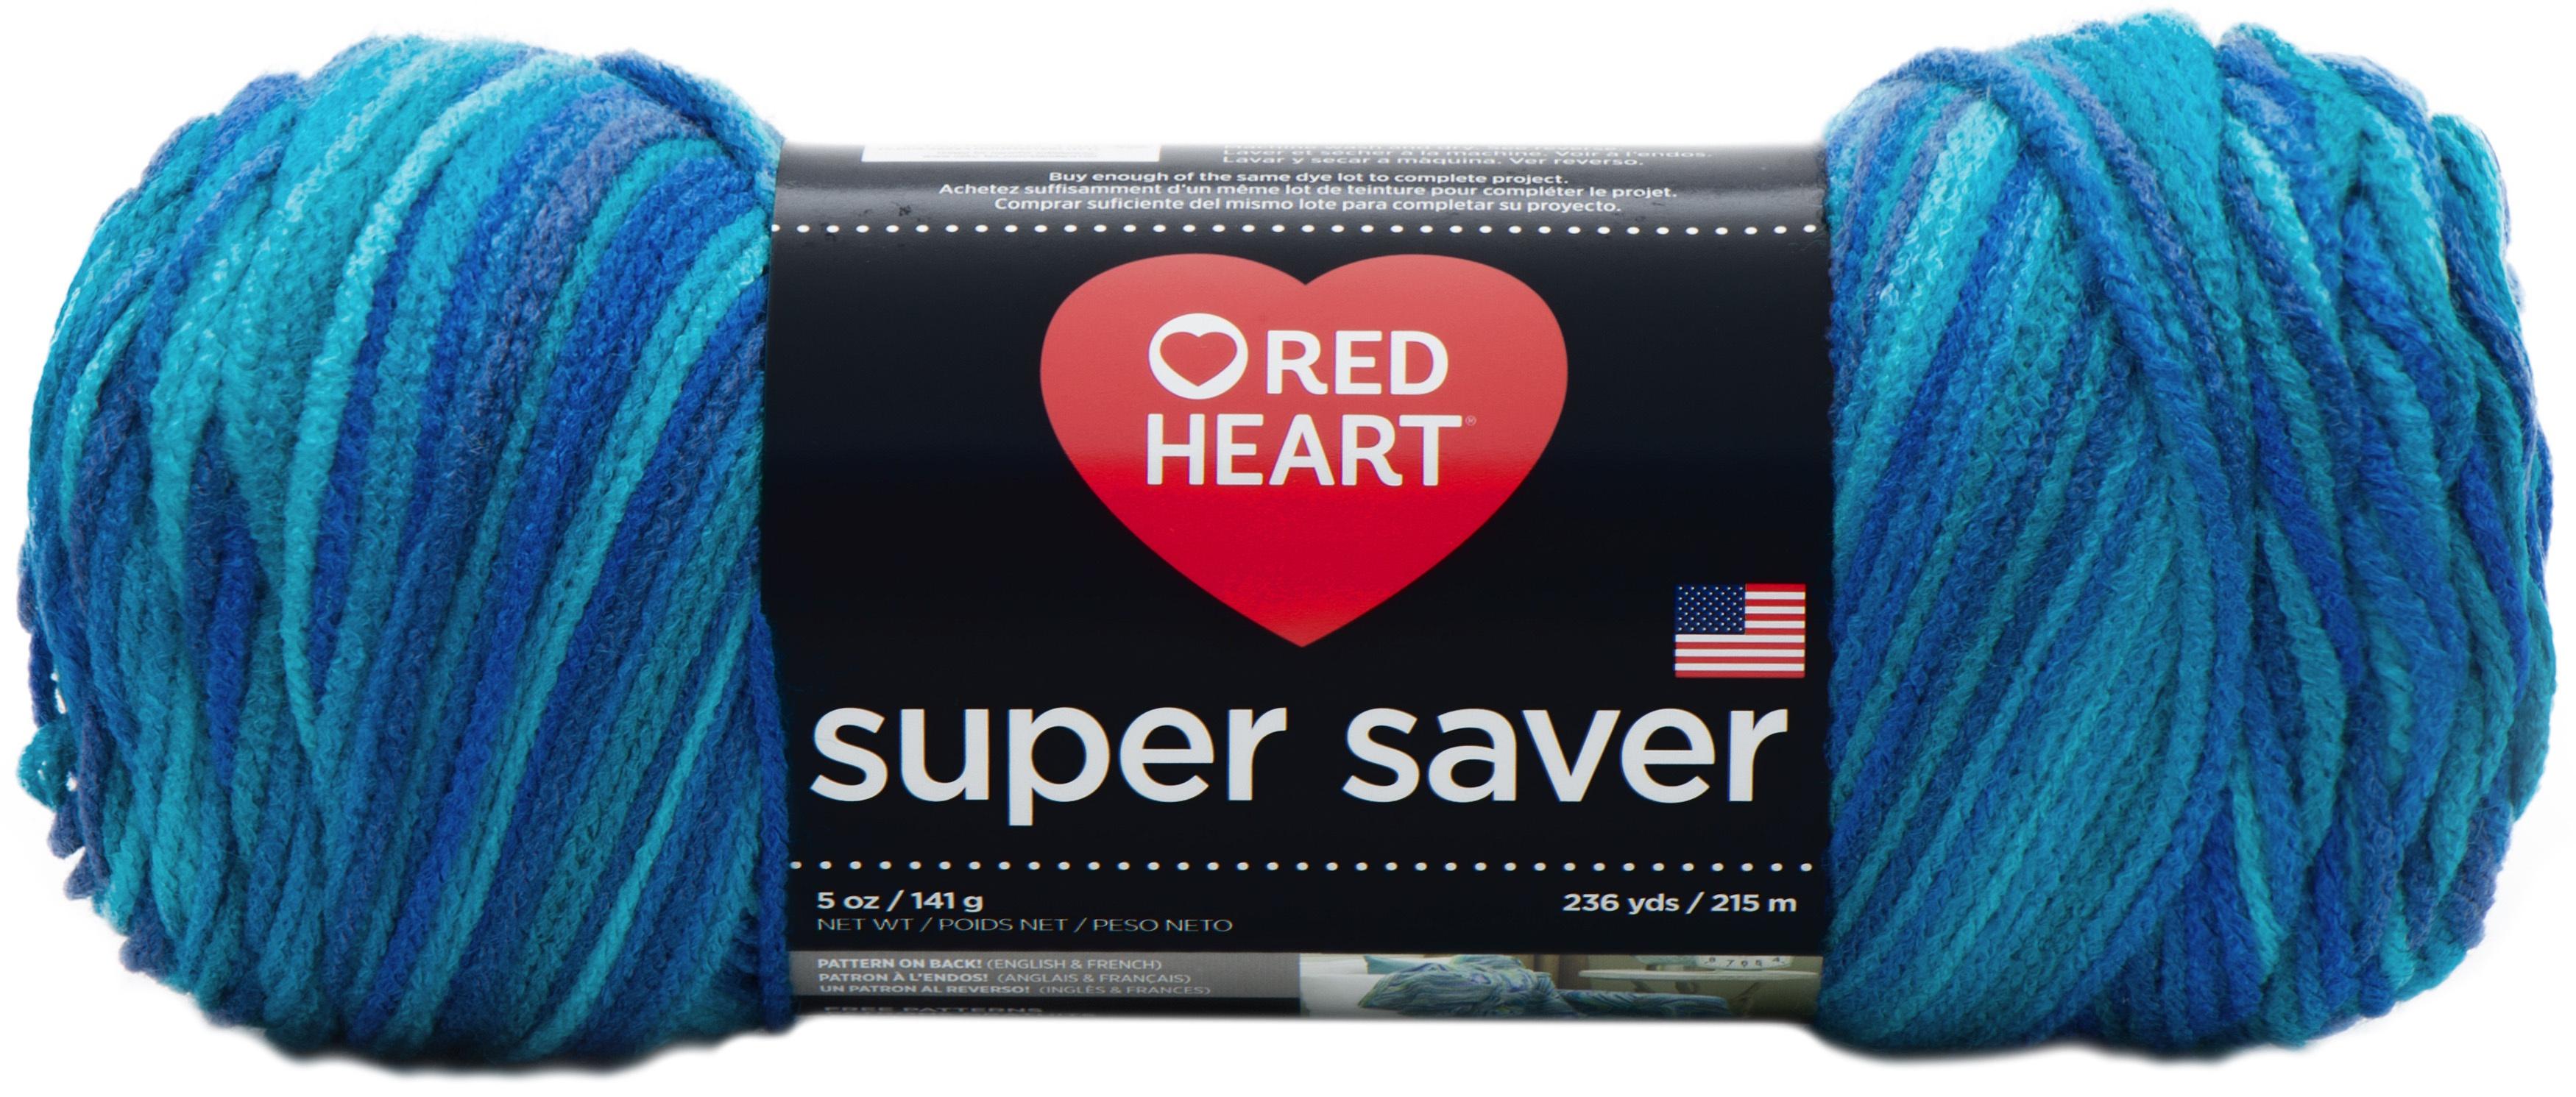 "Set Of 3/"" /""Red Heart Super Saver Yarn-Earthy"